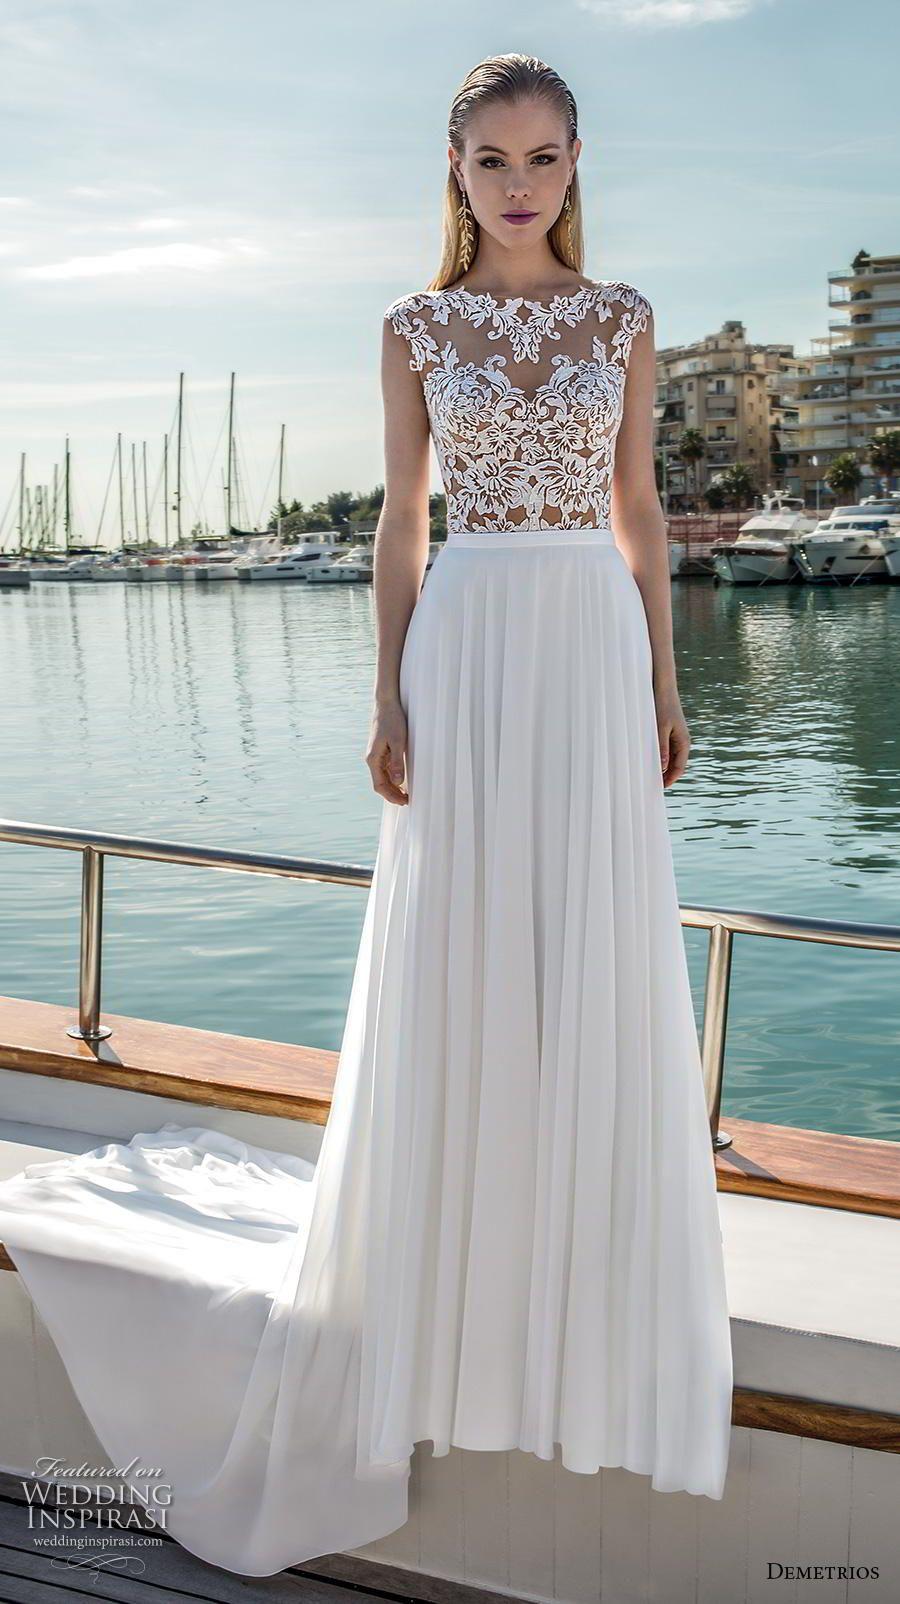 c2c6126a3e12 demetrios 2019 romance bridal cap sleeves bateau neckline heavily  embellished bodice modified a line wedding dress lace back sweep train (13)  mv ...